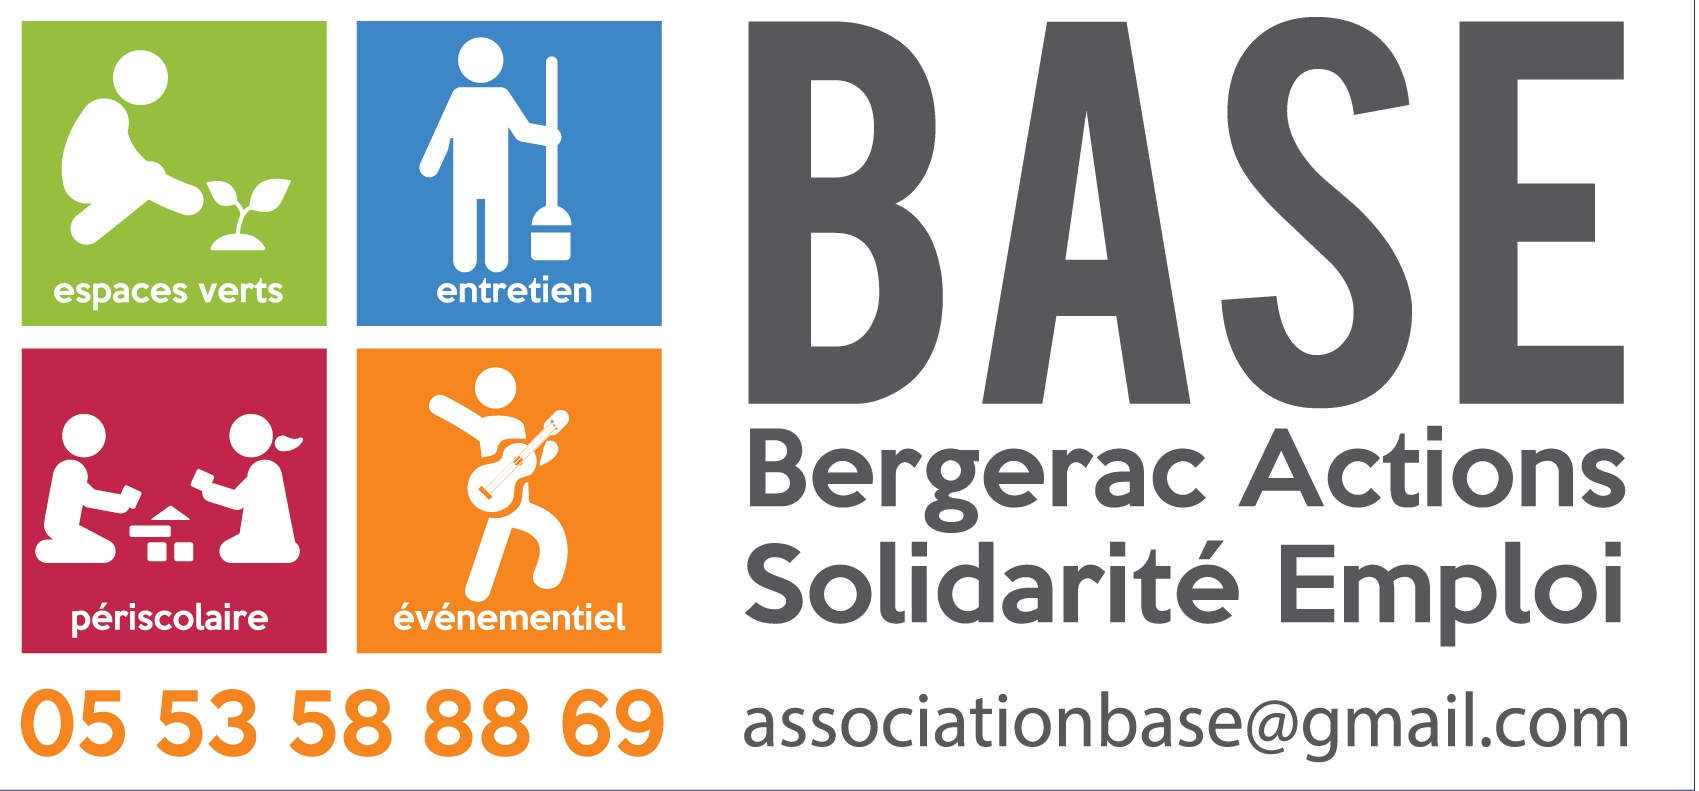 logo_1891_asso_base_logo.jpg